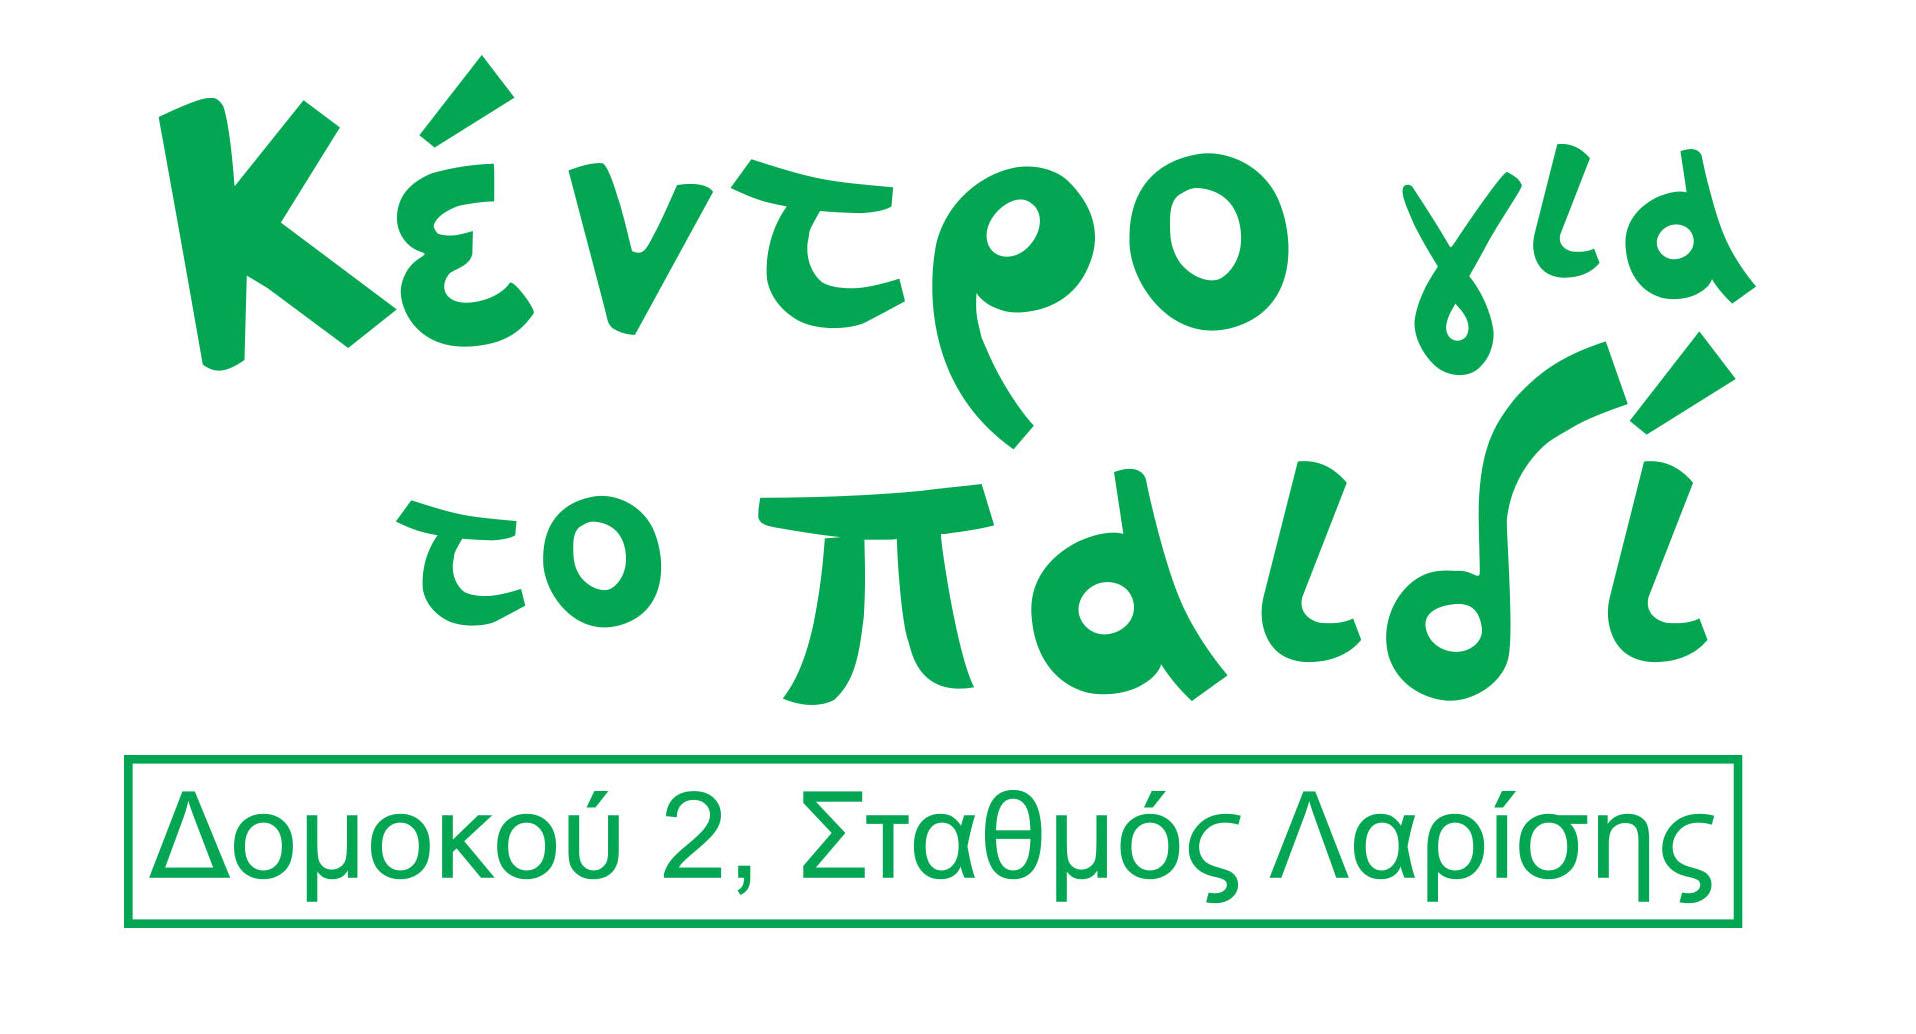 diktyo_logos_02 copy 3